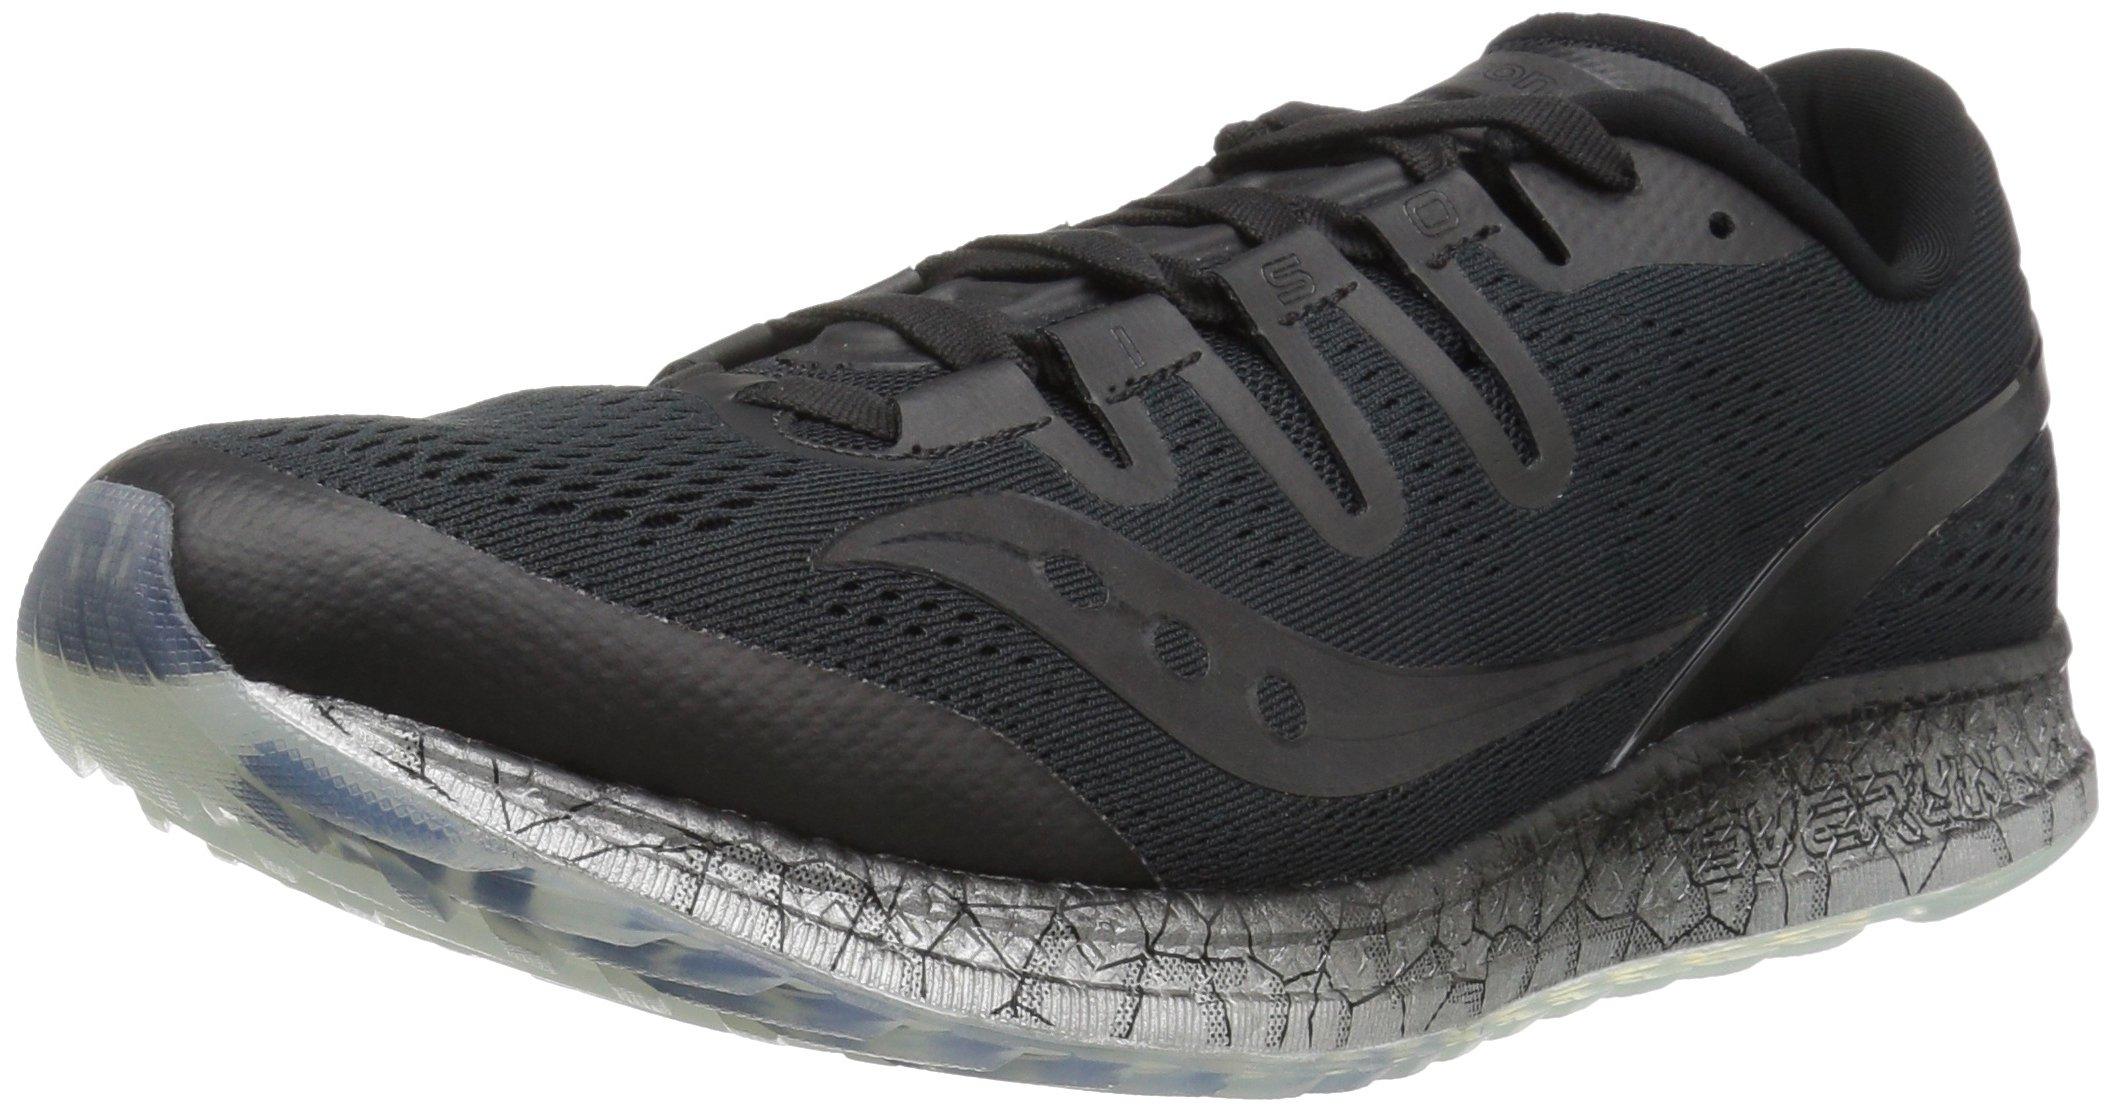 Saucony Men's Freedom ISO Running Shoe, Black, 10.5 M US